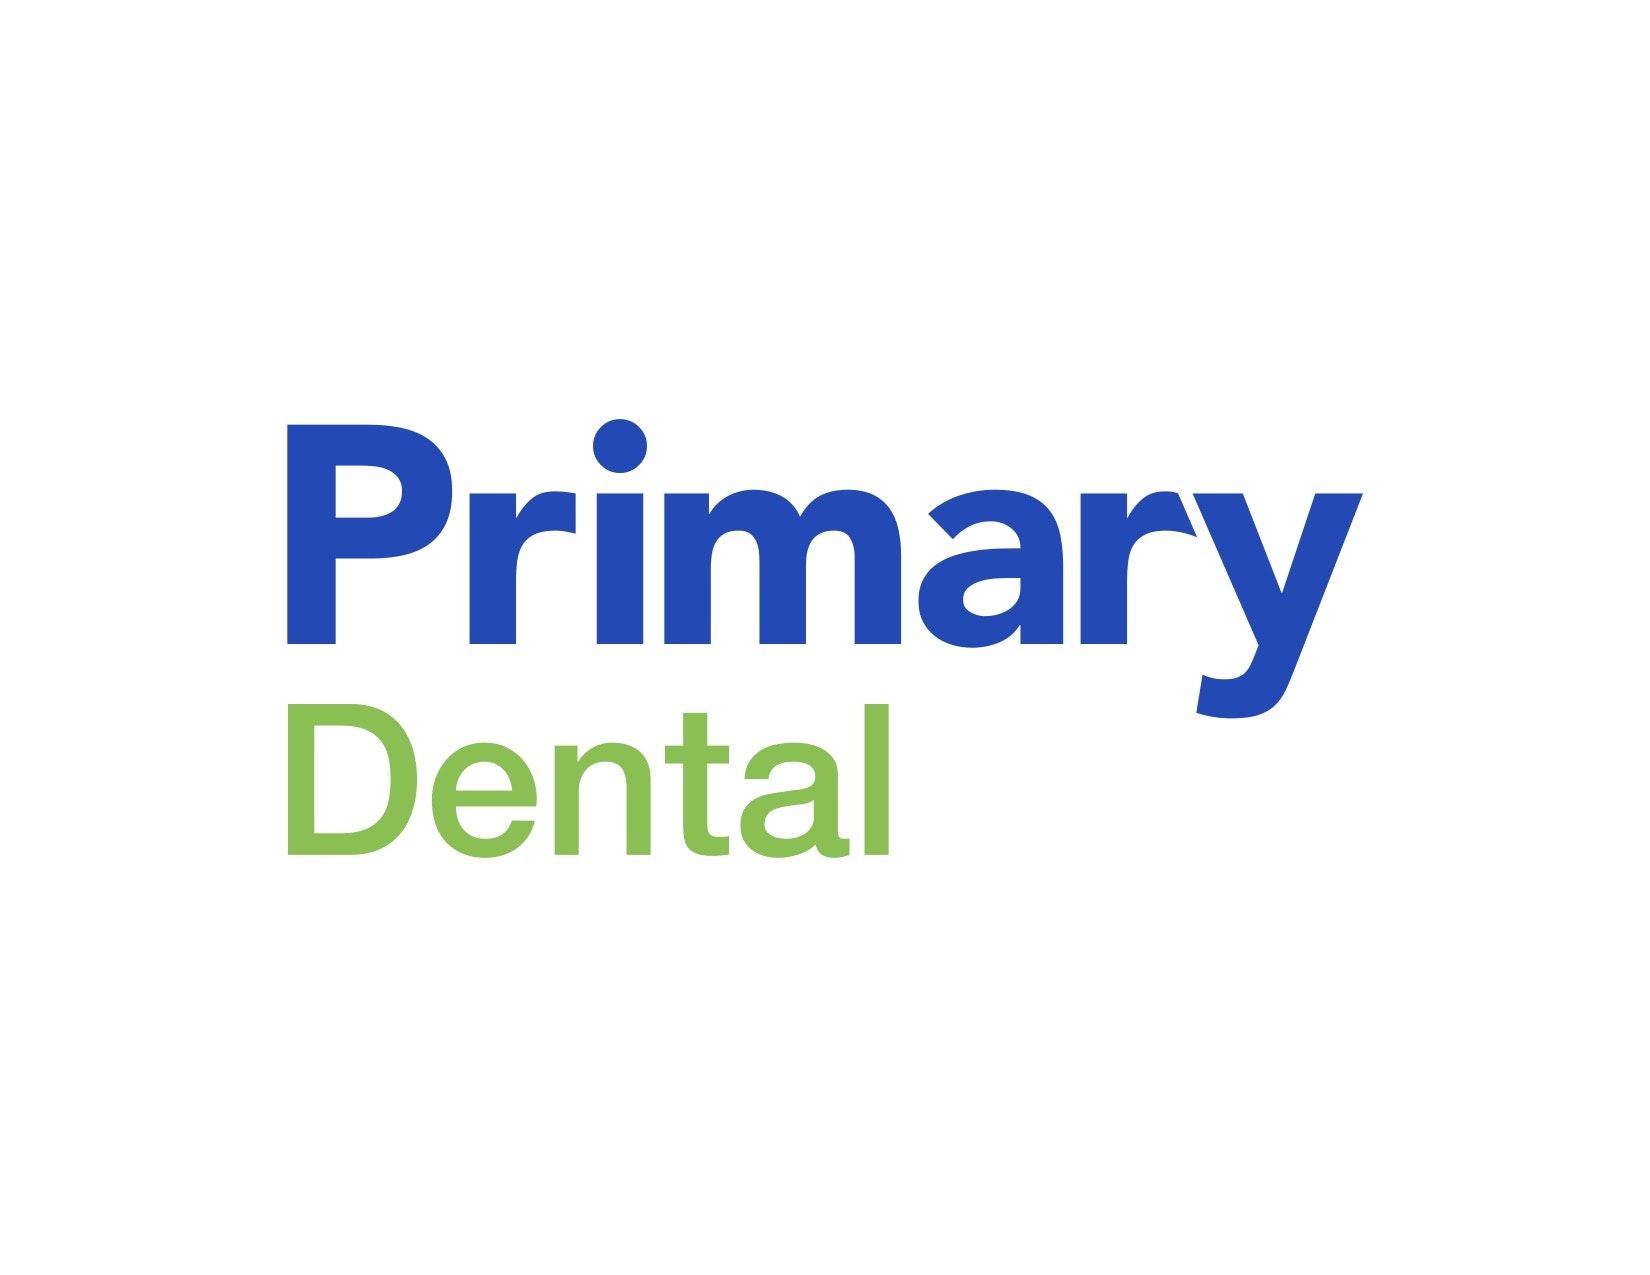 Victoria Point Medical & Dental Centre (Primary Dental)